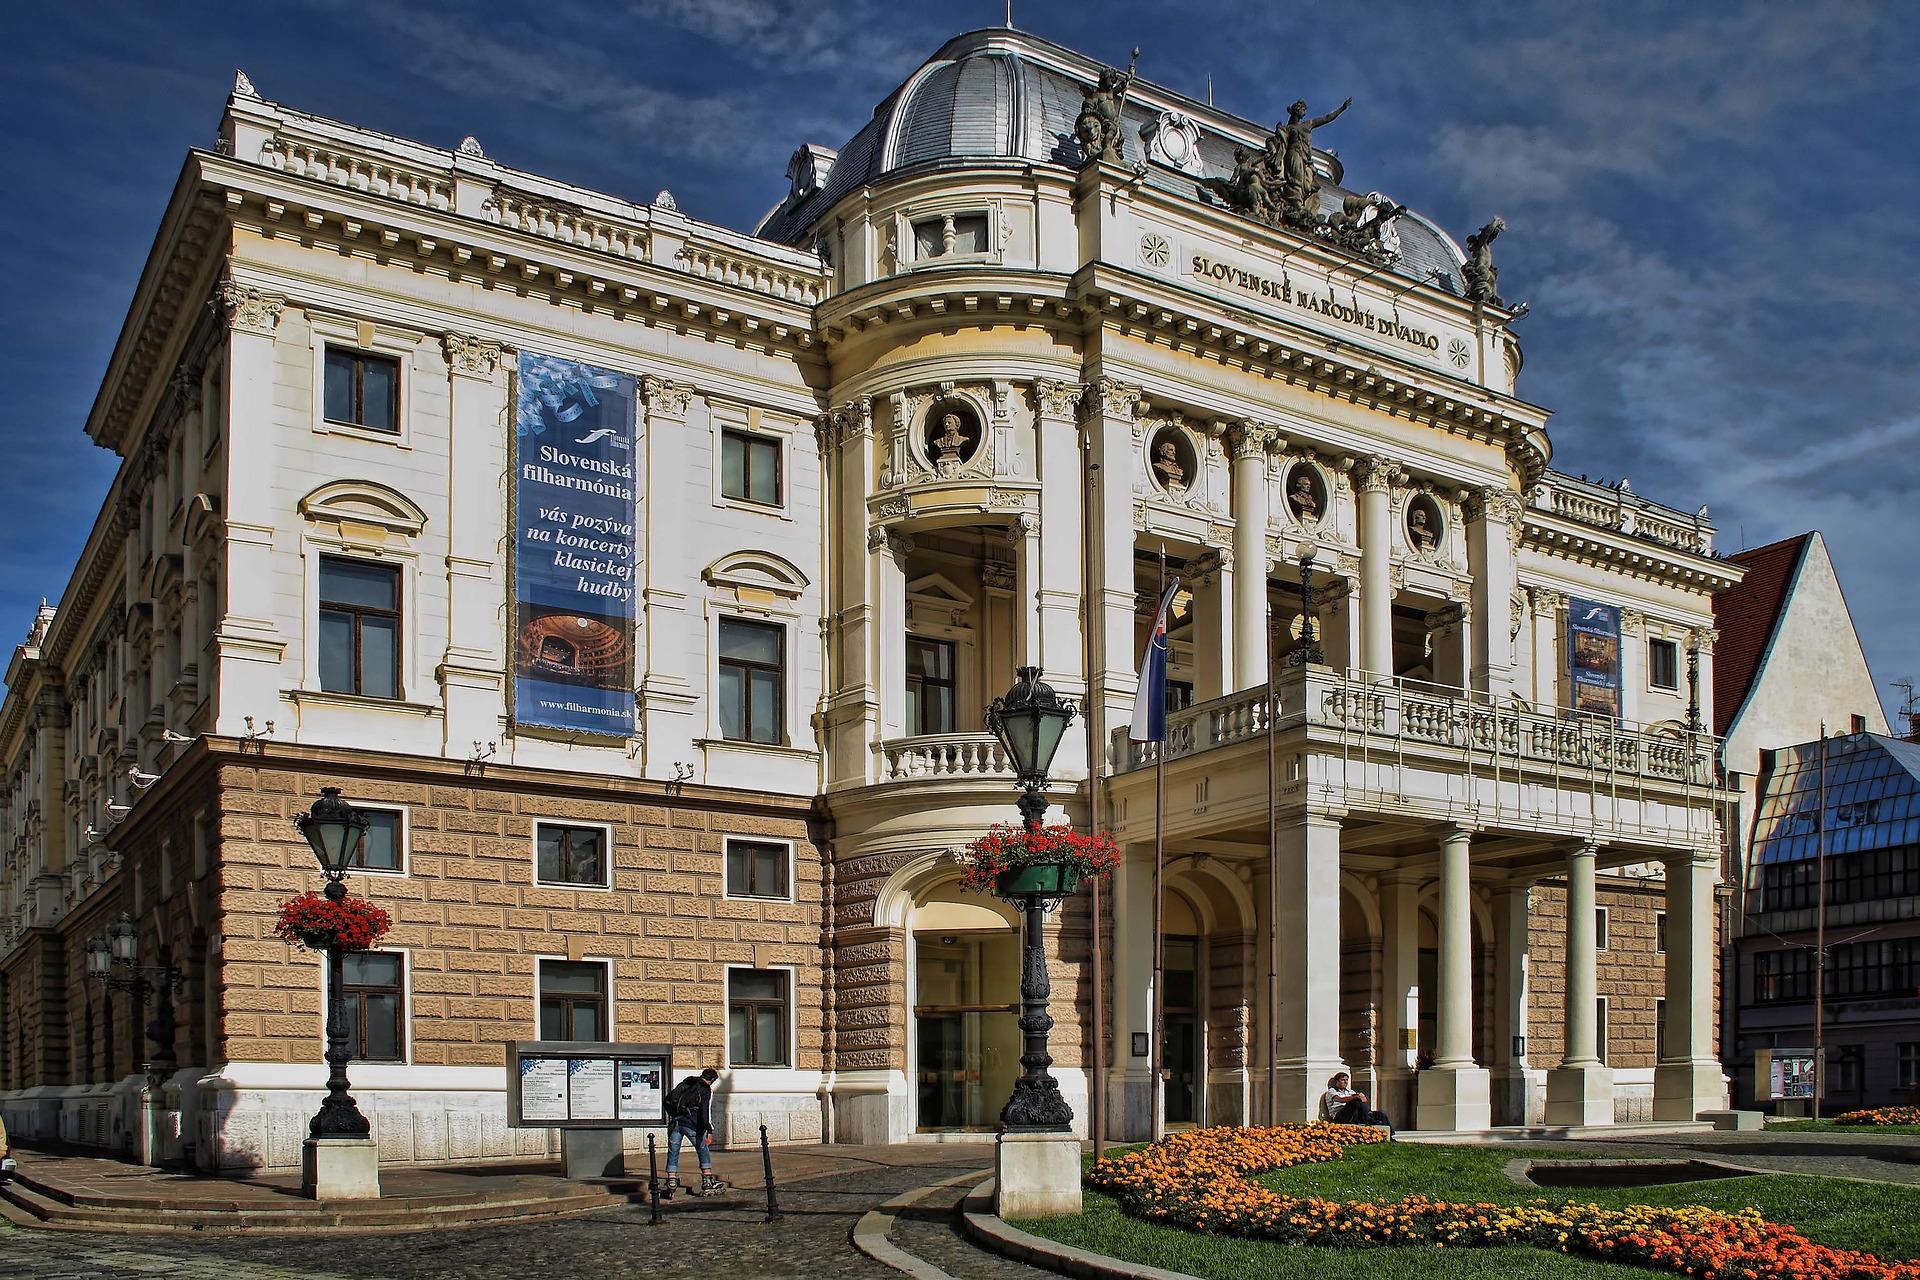 La ville de Bratislava en Slovaquie